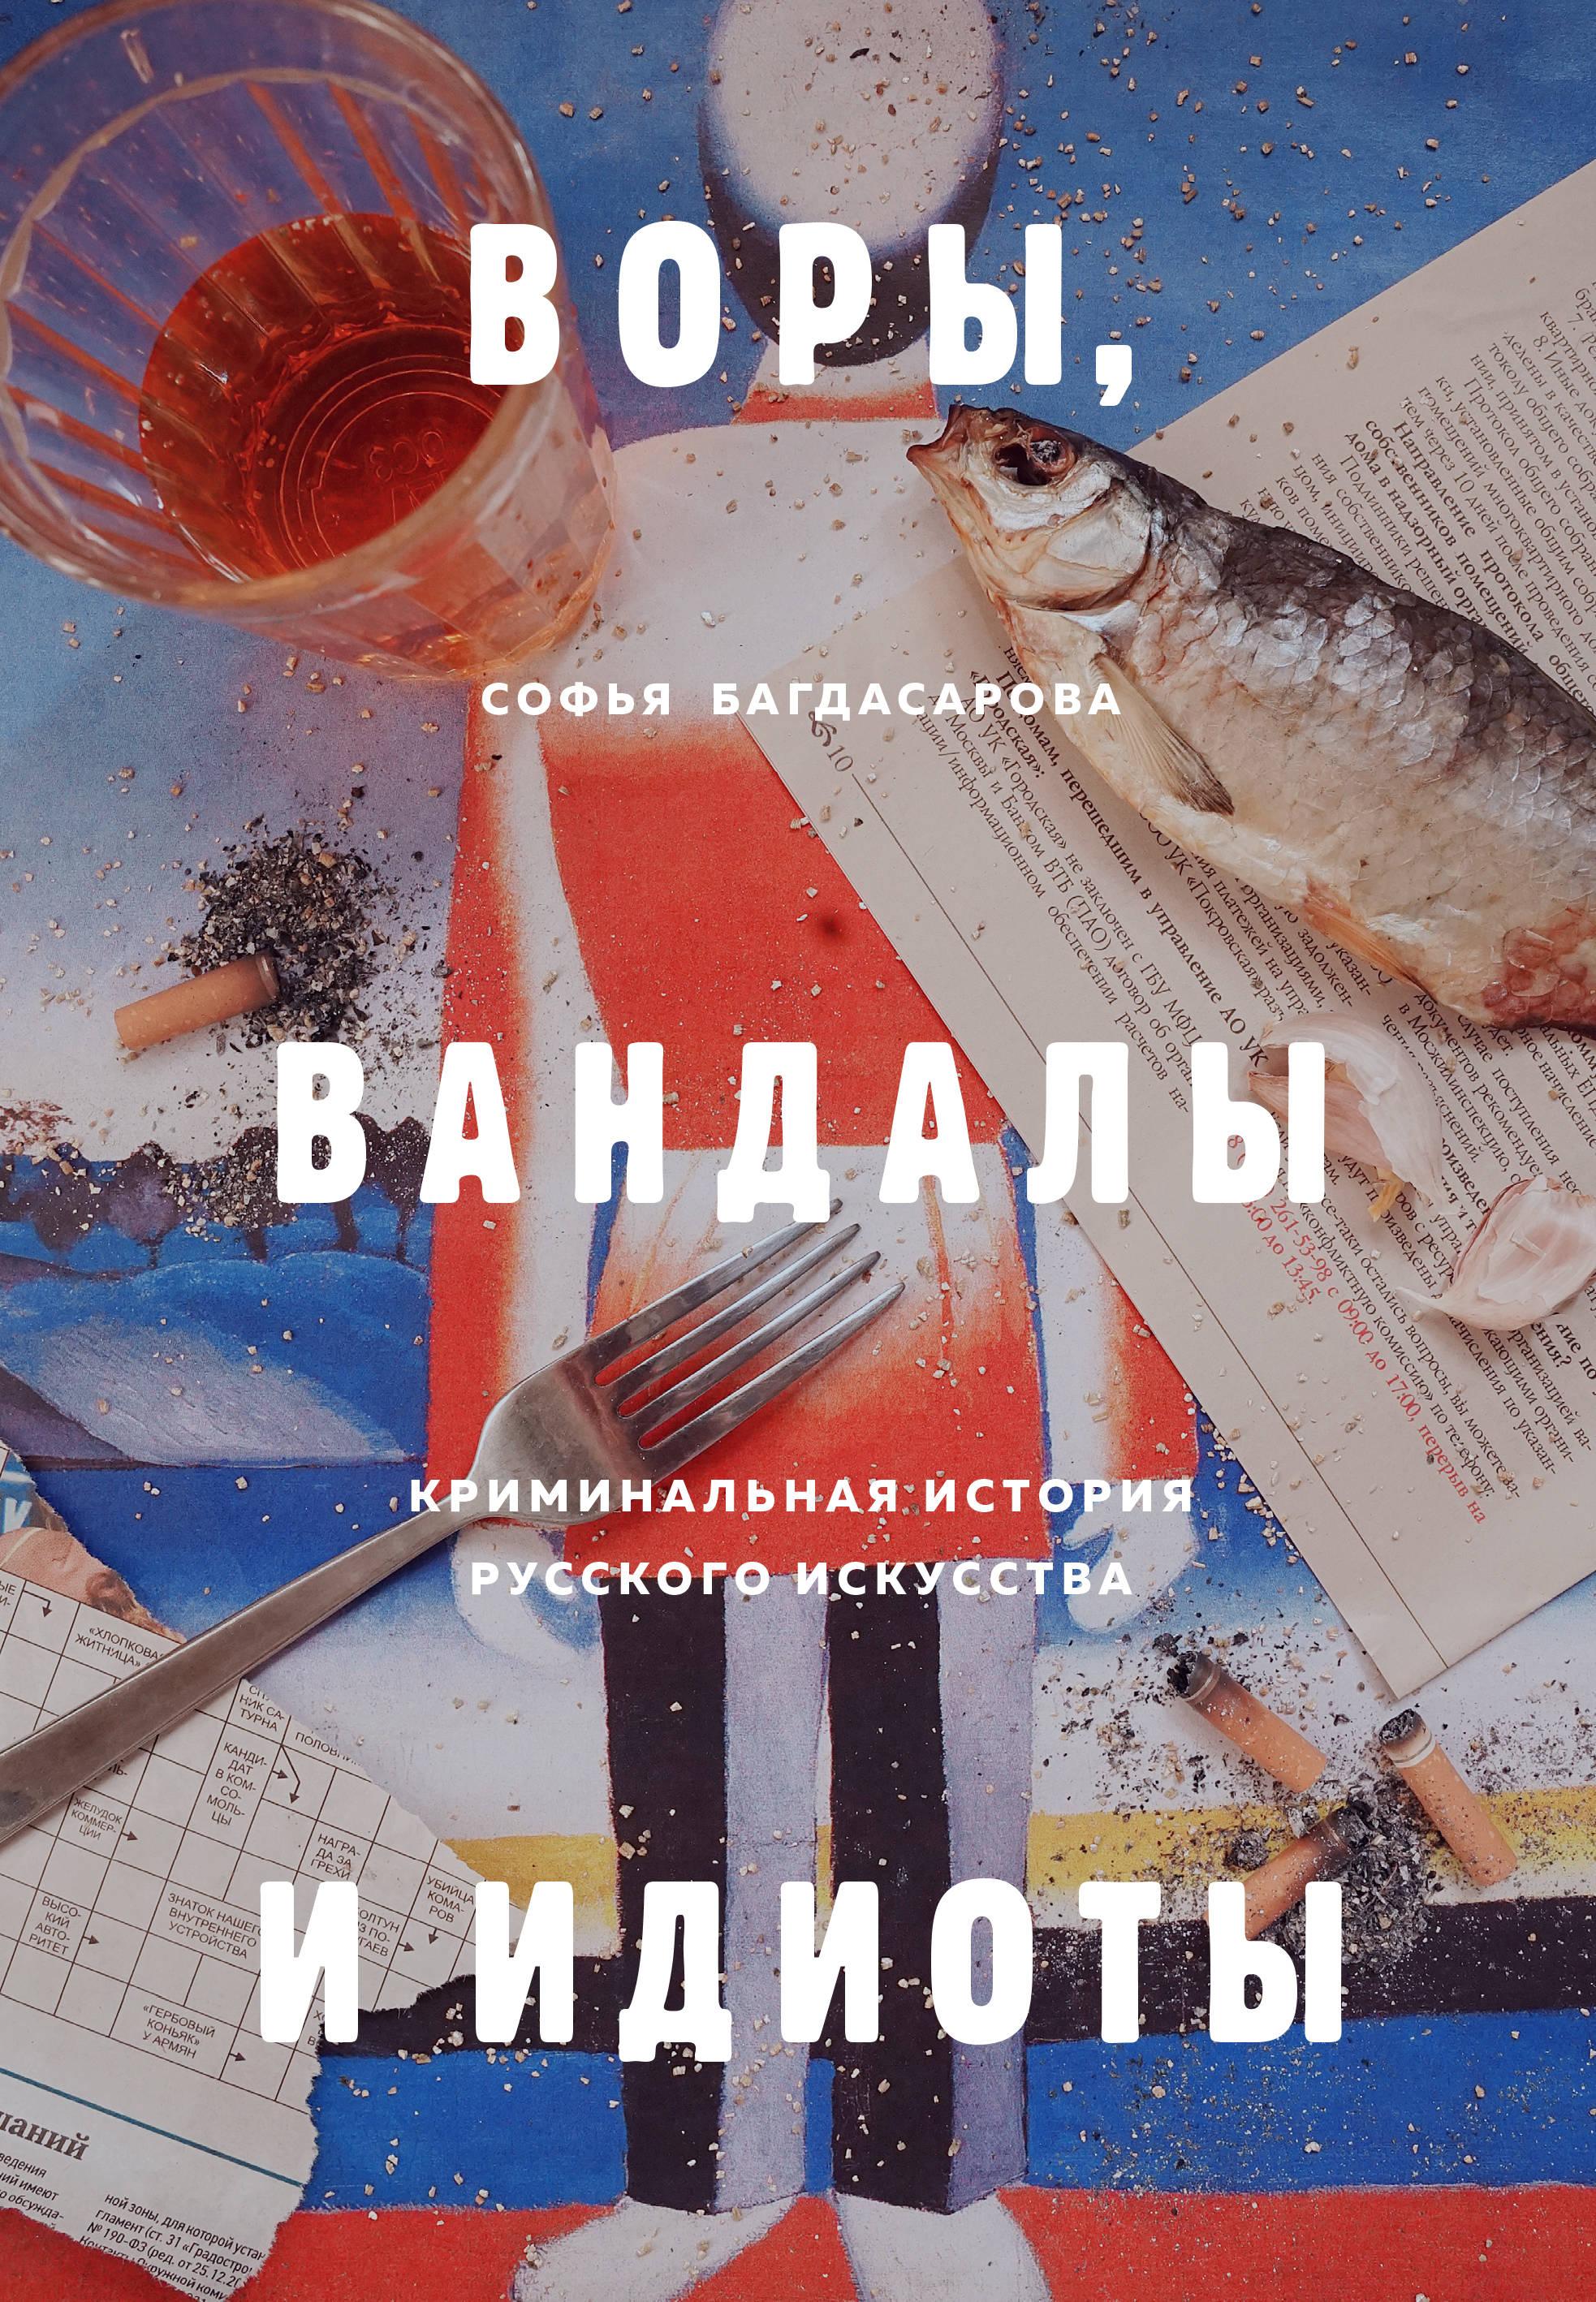 VORY, VANDALY I IDIOTY: Kriminalnaja istorija russkogo iskusstva